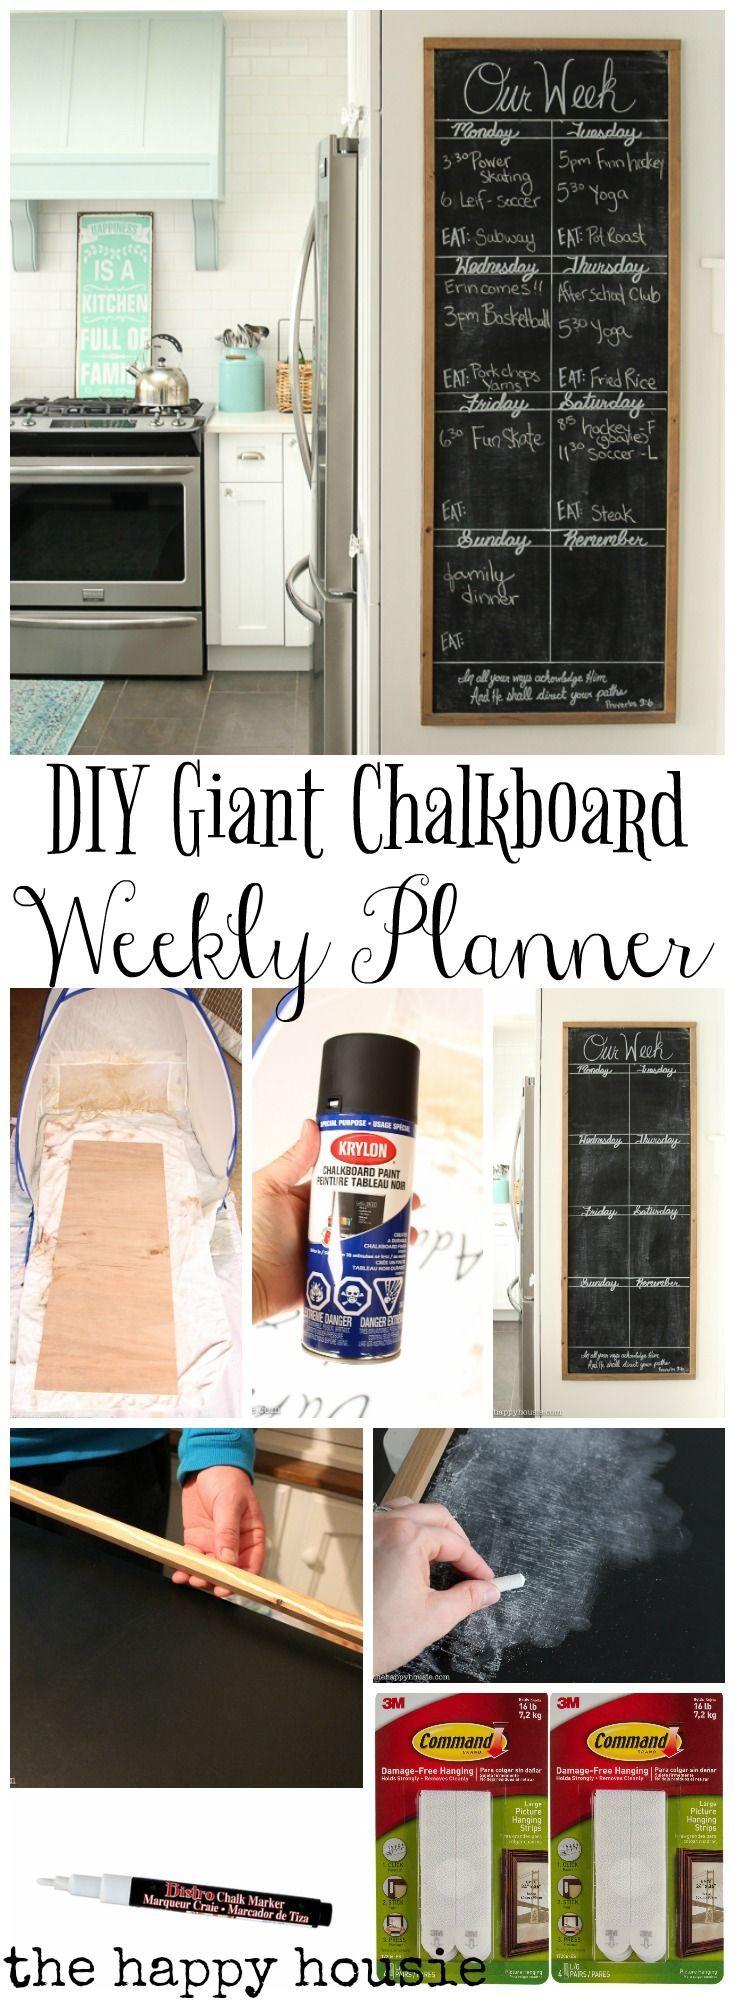 Diy Giant Chalkboard Kitchen Weekly Planner